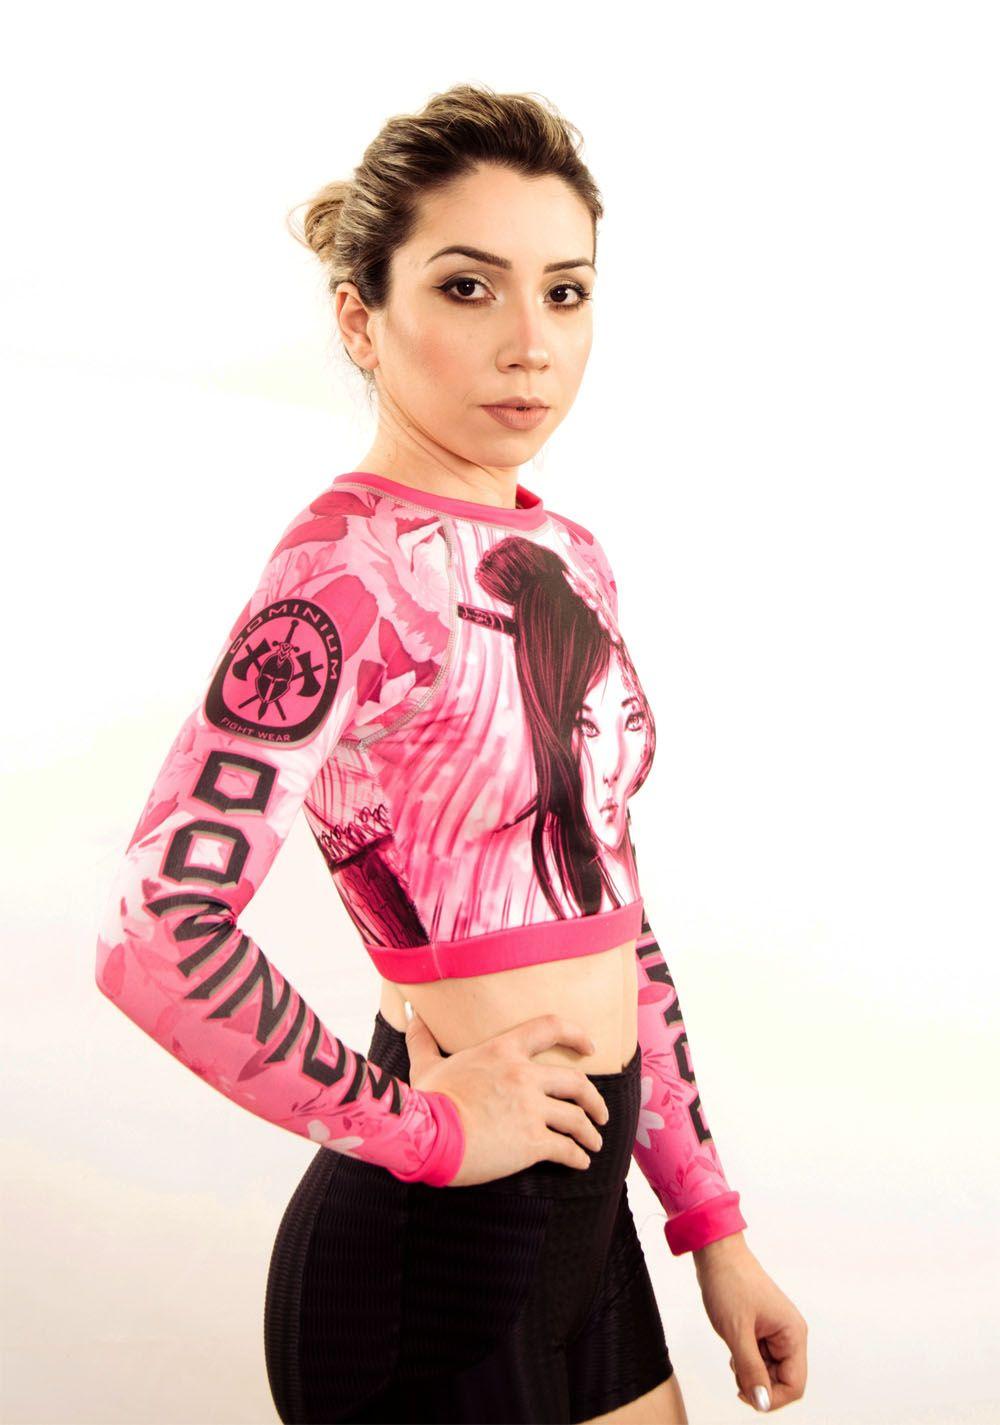 Camisa Rash Guard Feminina Manga Longa Gueixa - Cropped- Dominium  - Loja do Competidor